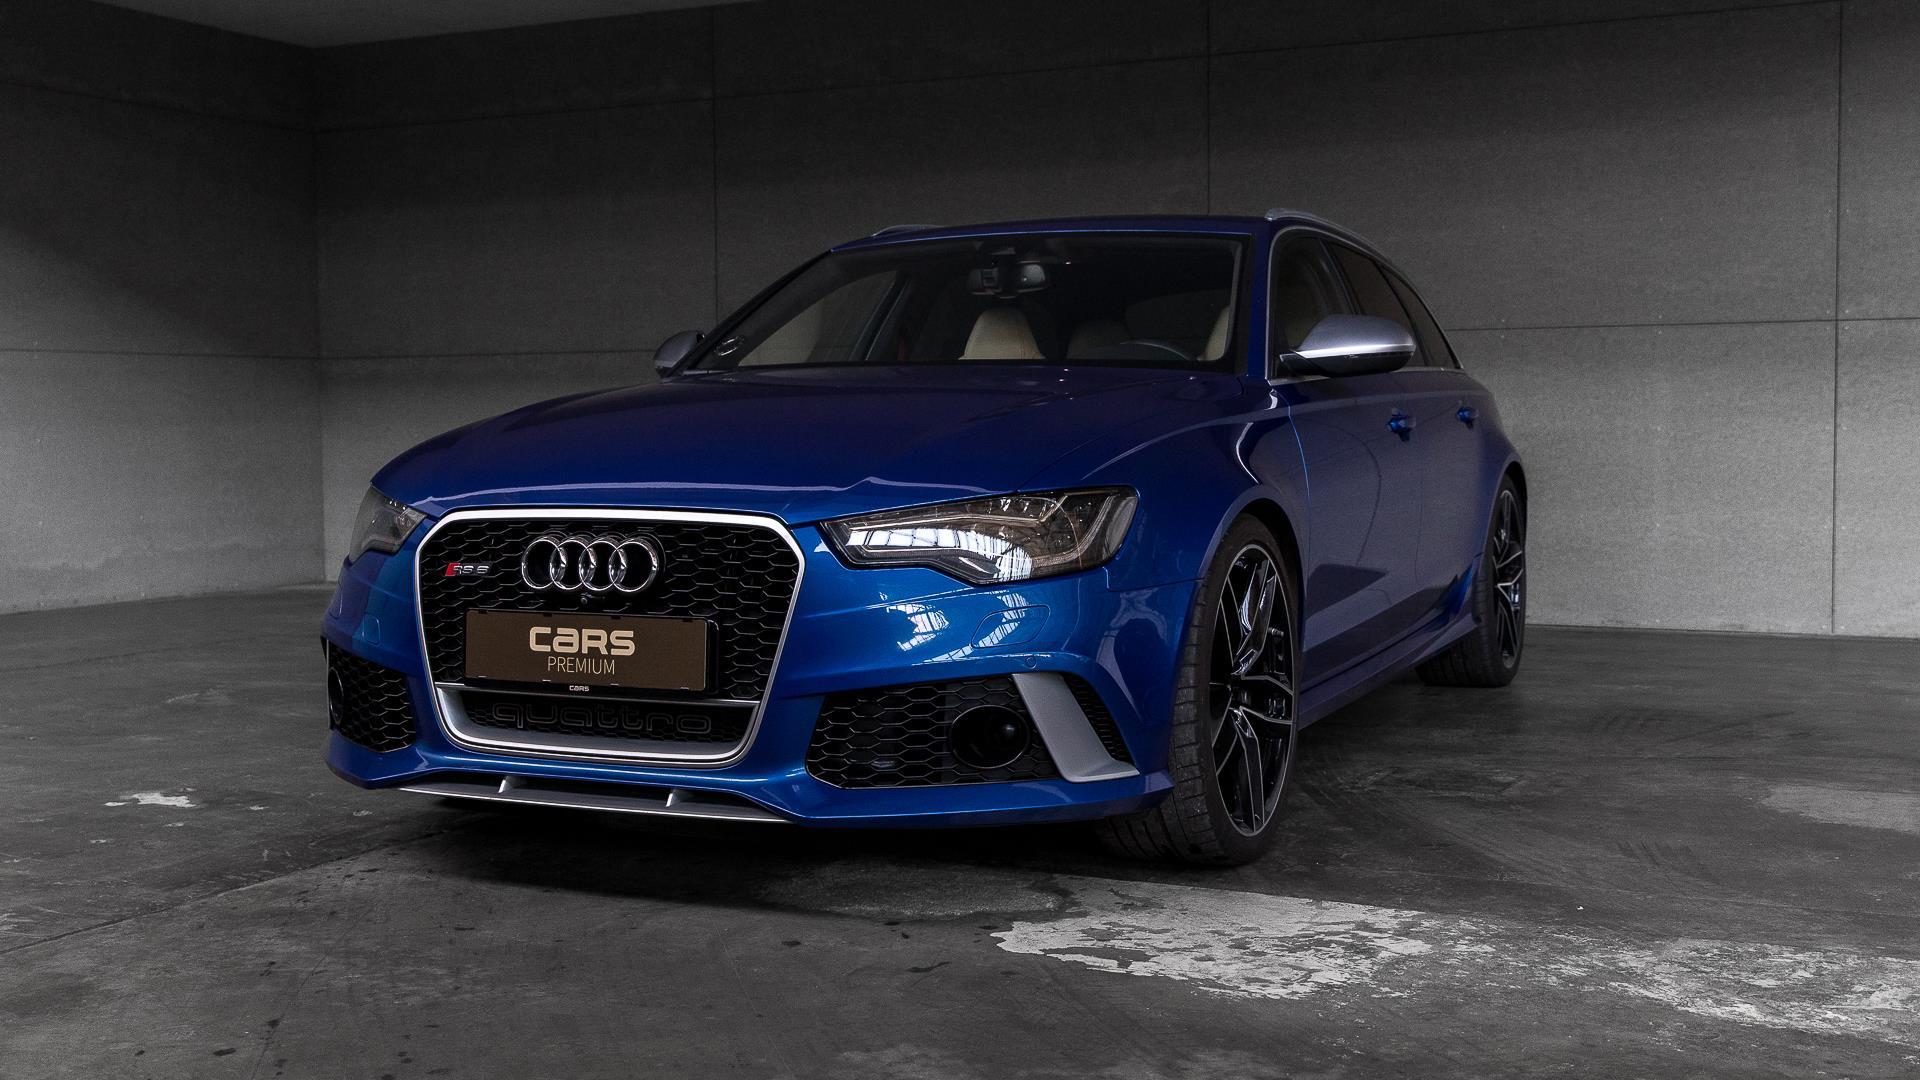 Billede af Audi RS 6 Avant 4,0 TFSI Quattro Tiptr. 560HK Stc 8g Aut.